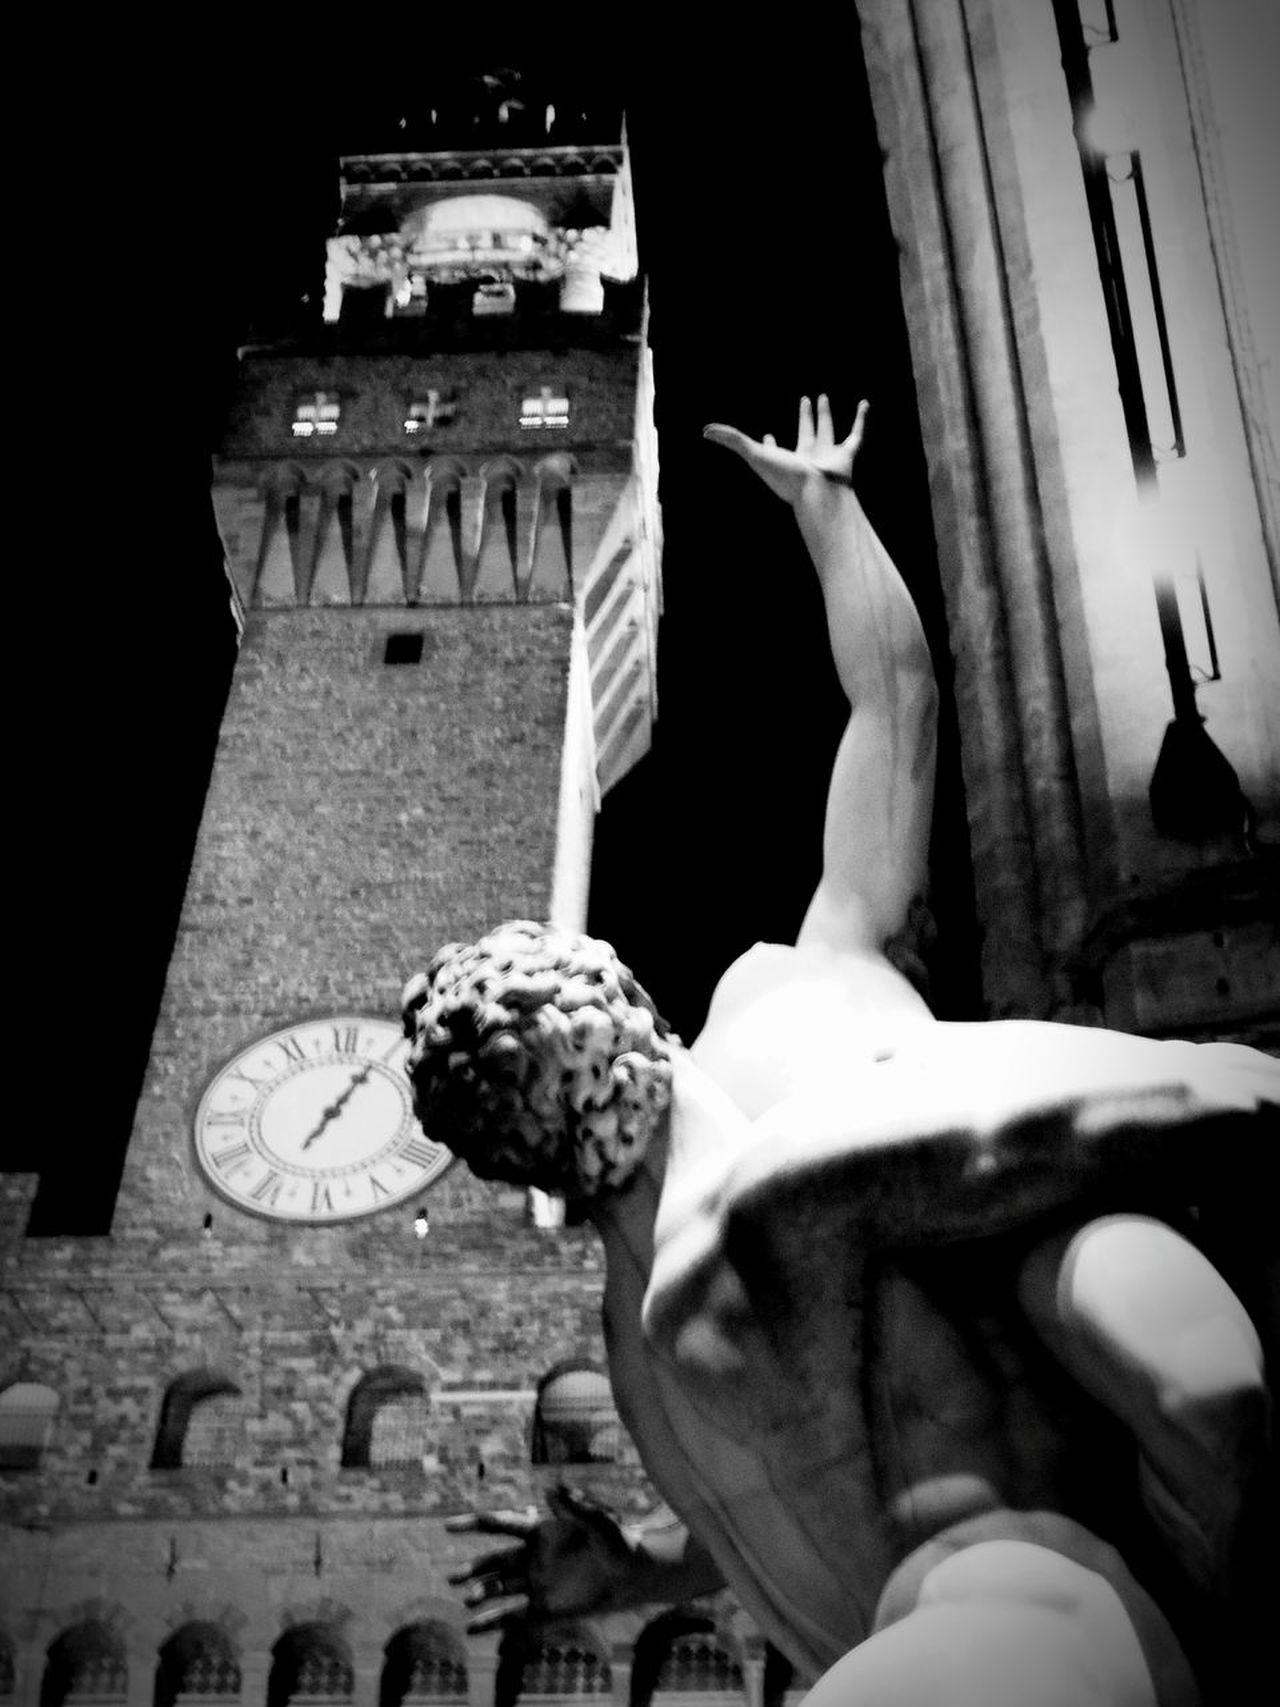 Firenze Firenze Reminiscences Sculpture Palazo Vecchio Toscana Toscany Italy The Street Photographer - 2015 EyeEm Awards